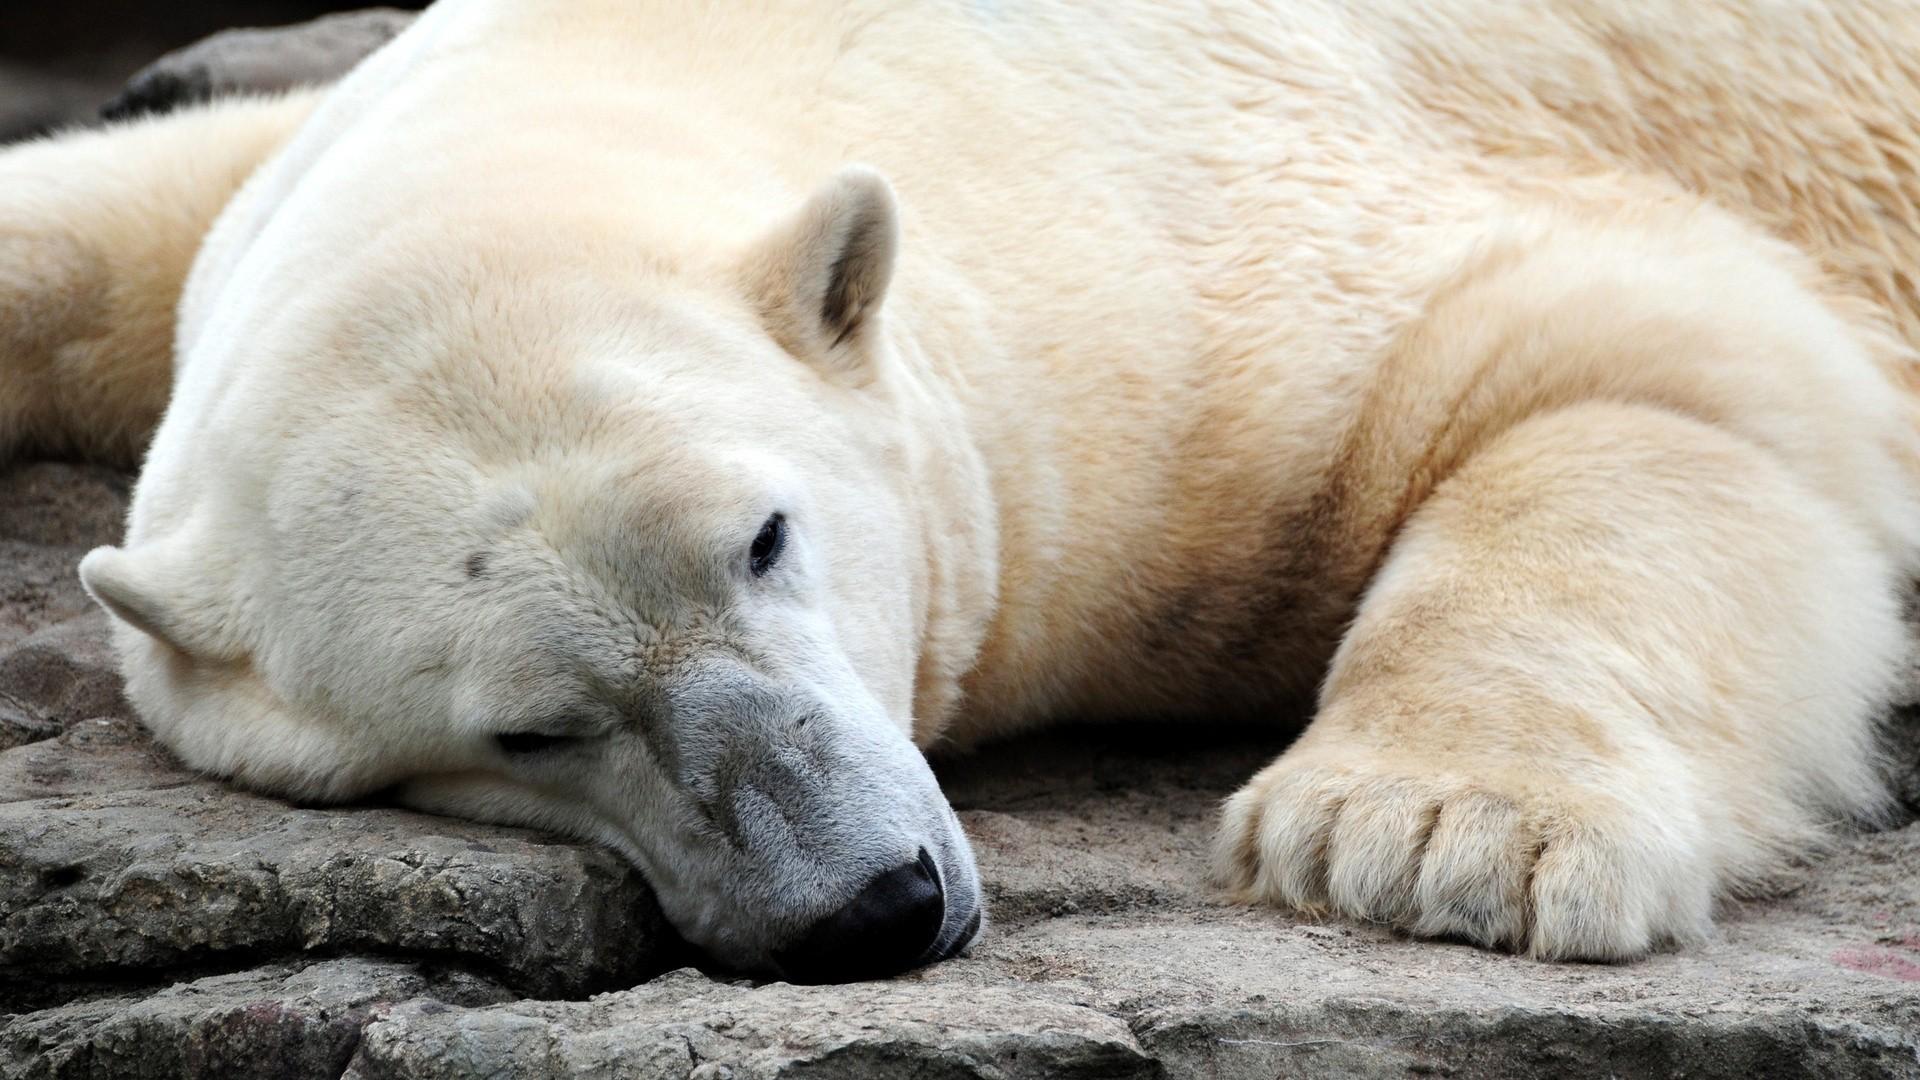 Polar Bear Wallpaper Picture hd